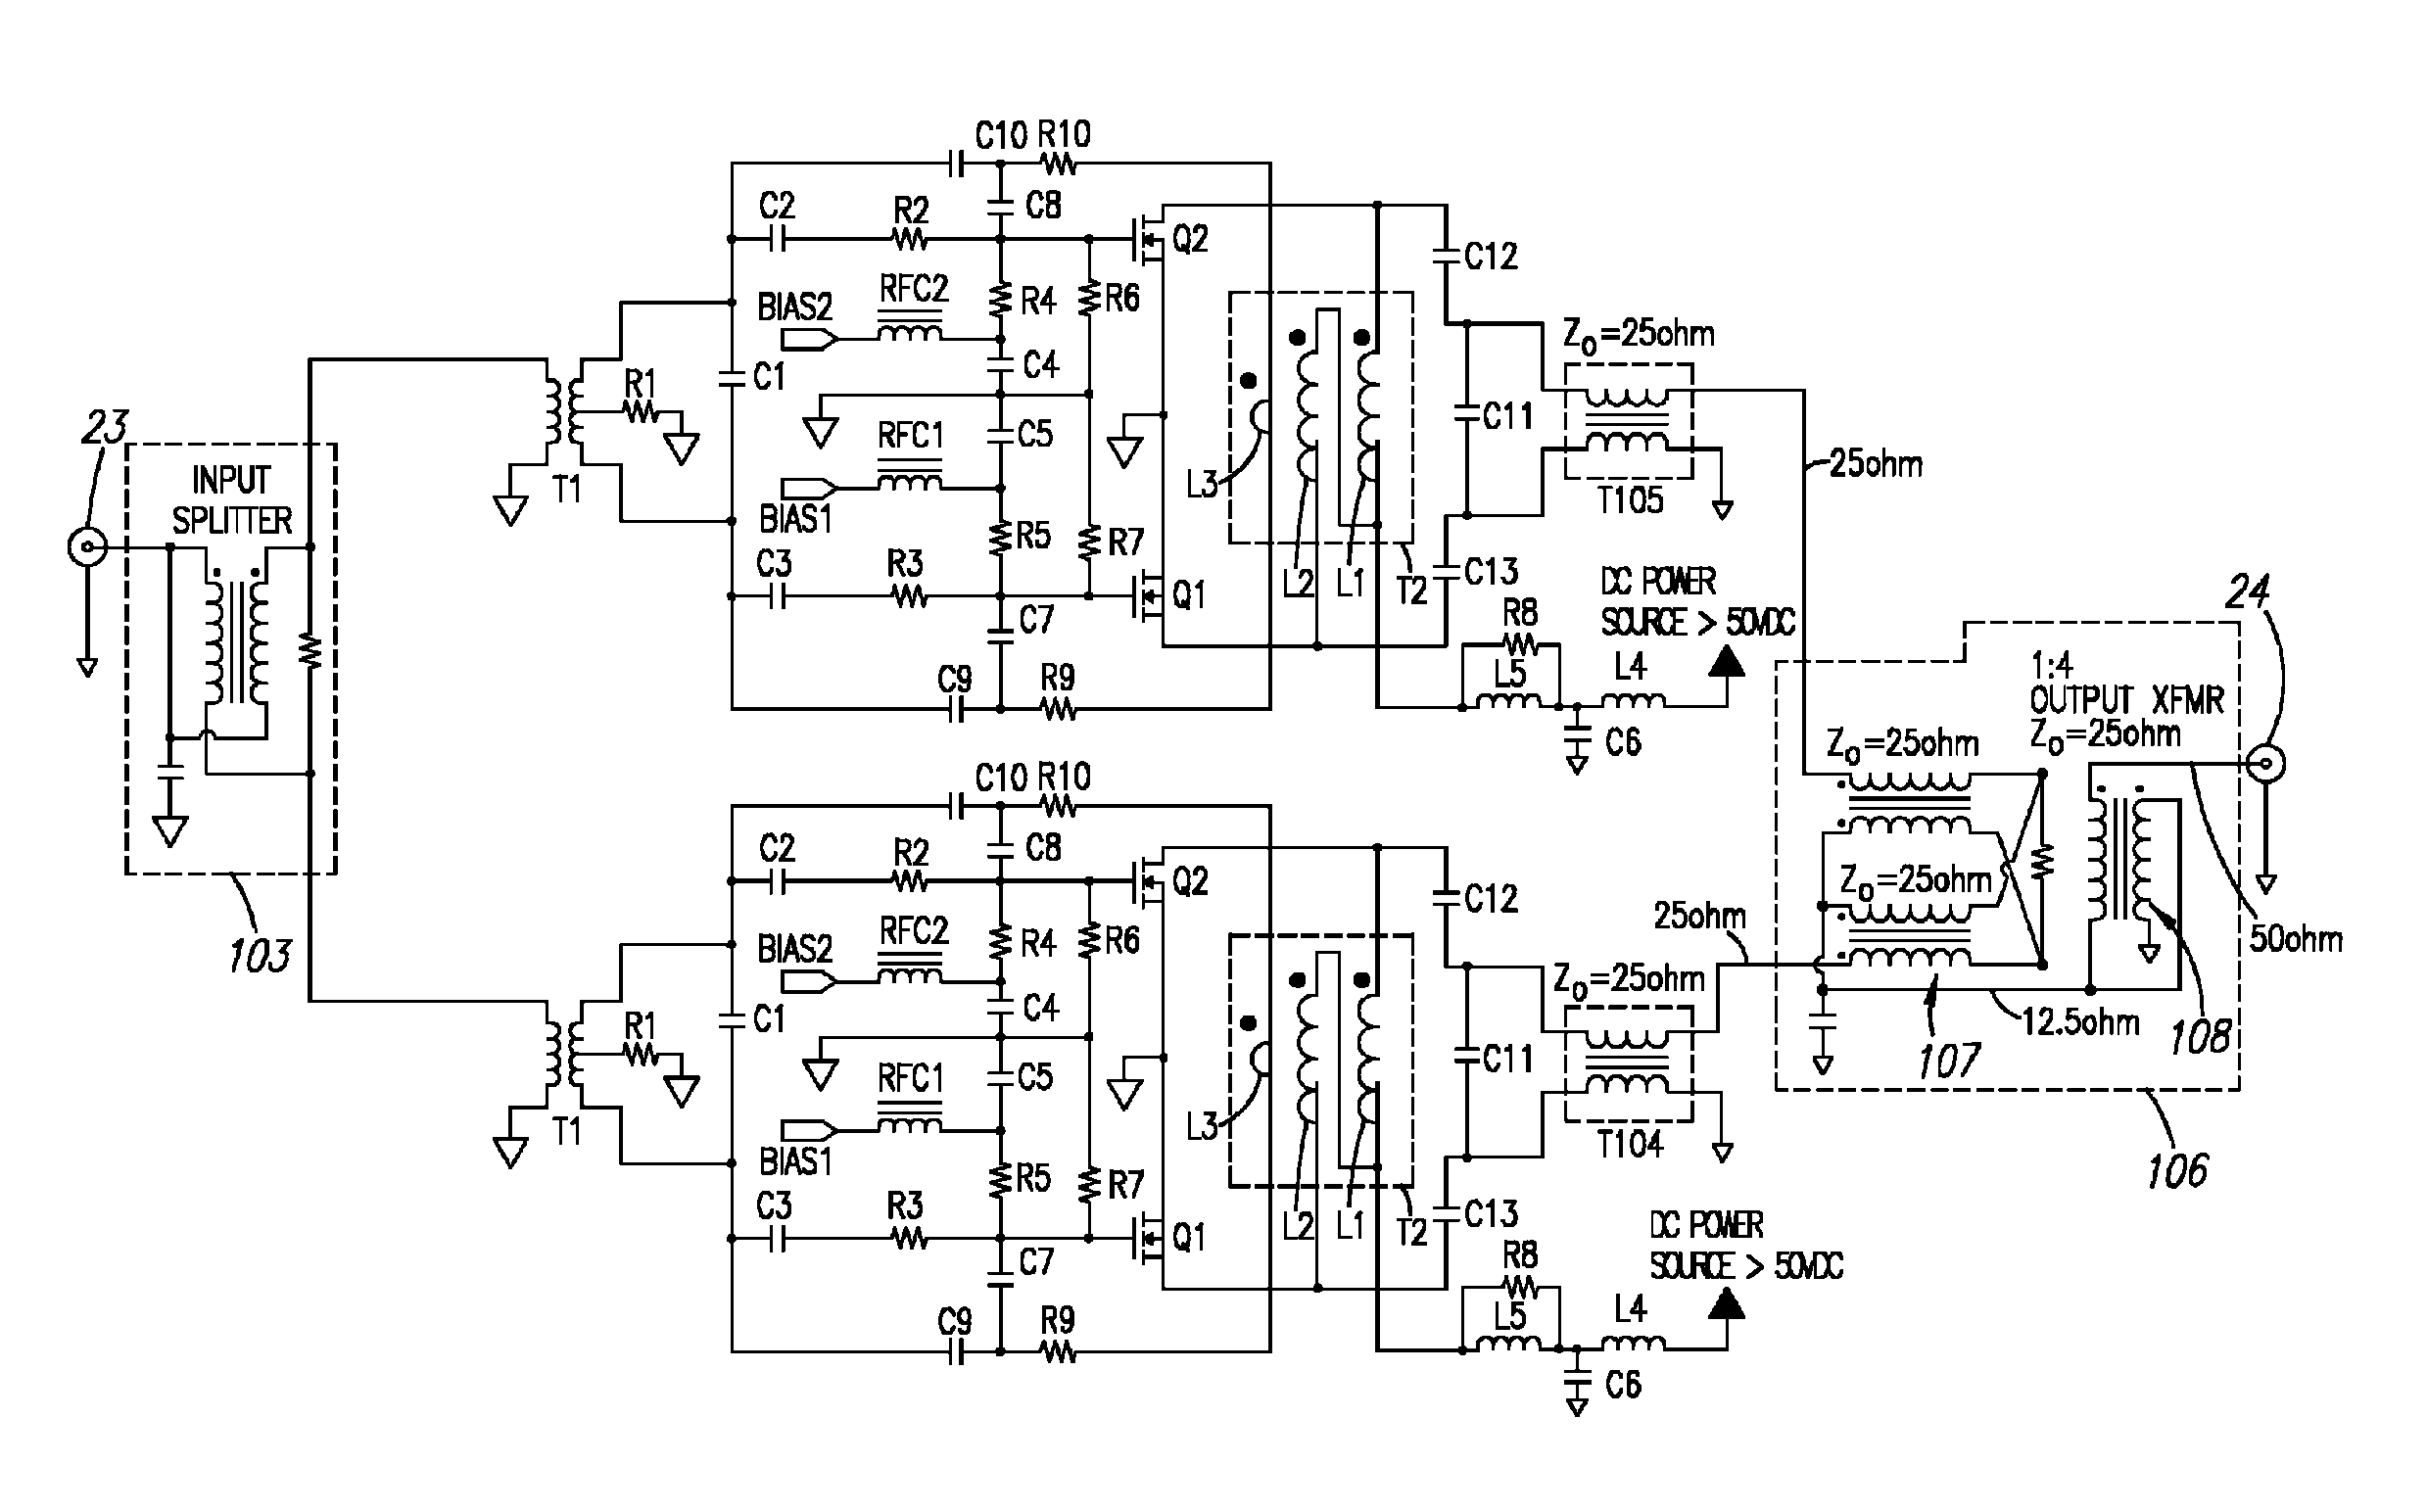 Motorola Cm200 Wiring Diagram Electrical Diagrams Cm300 Programming Cable Pinout Rib Radio